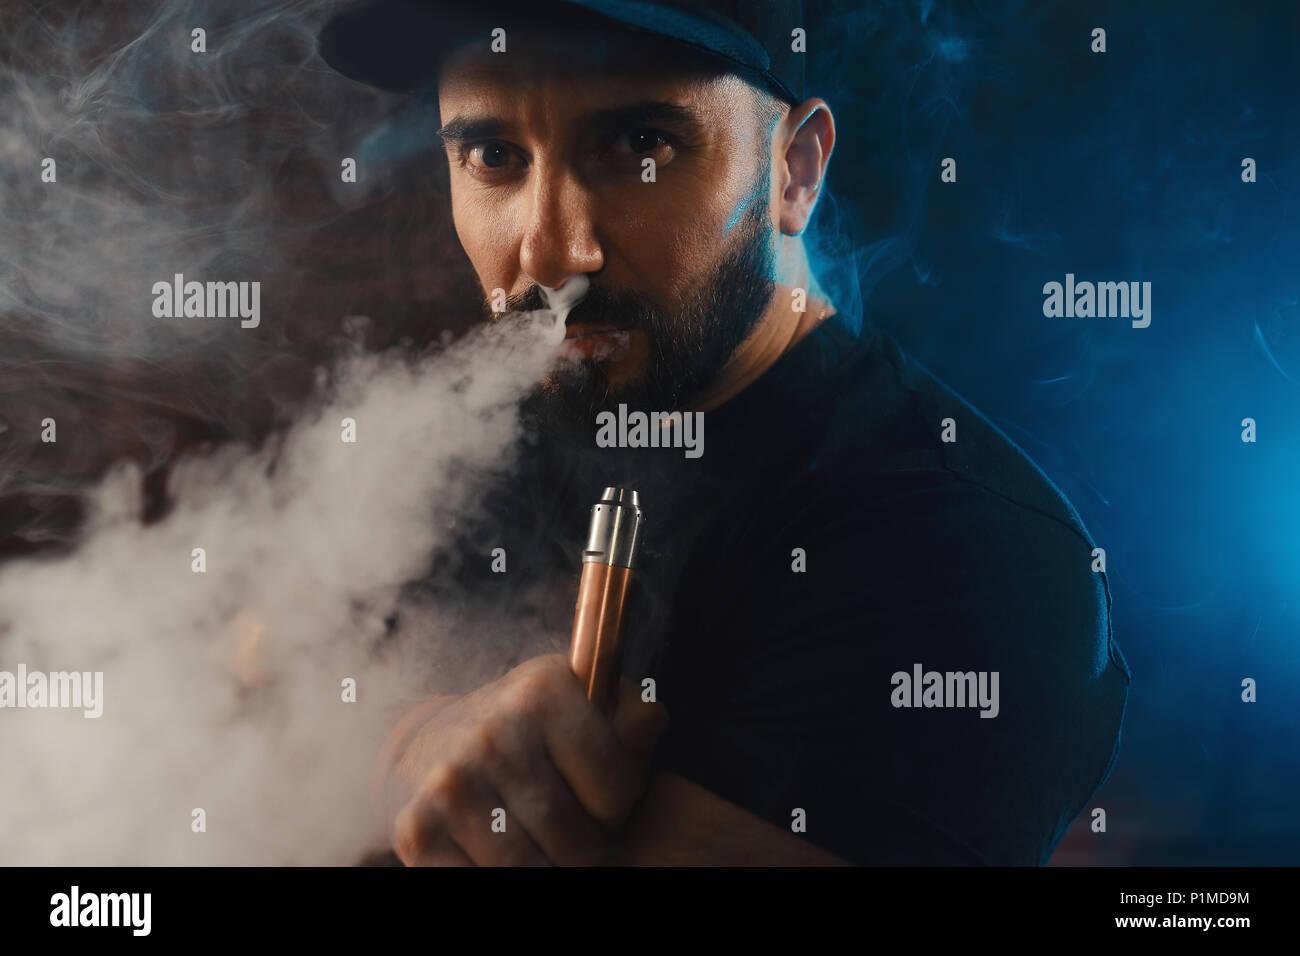 Man vaping an electronic cigarette - Stock Image